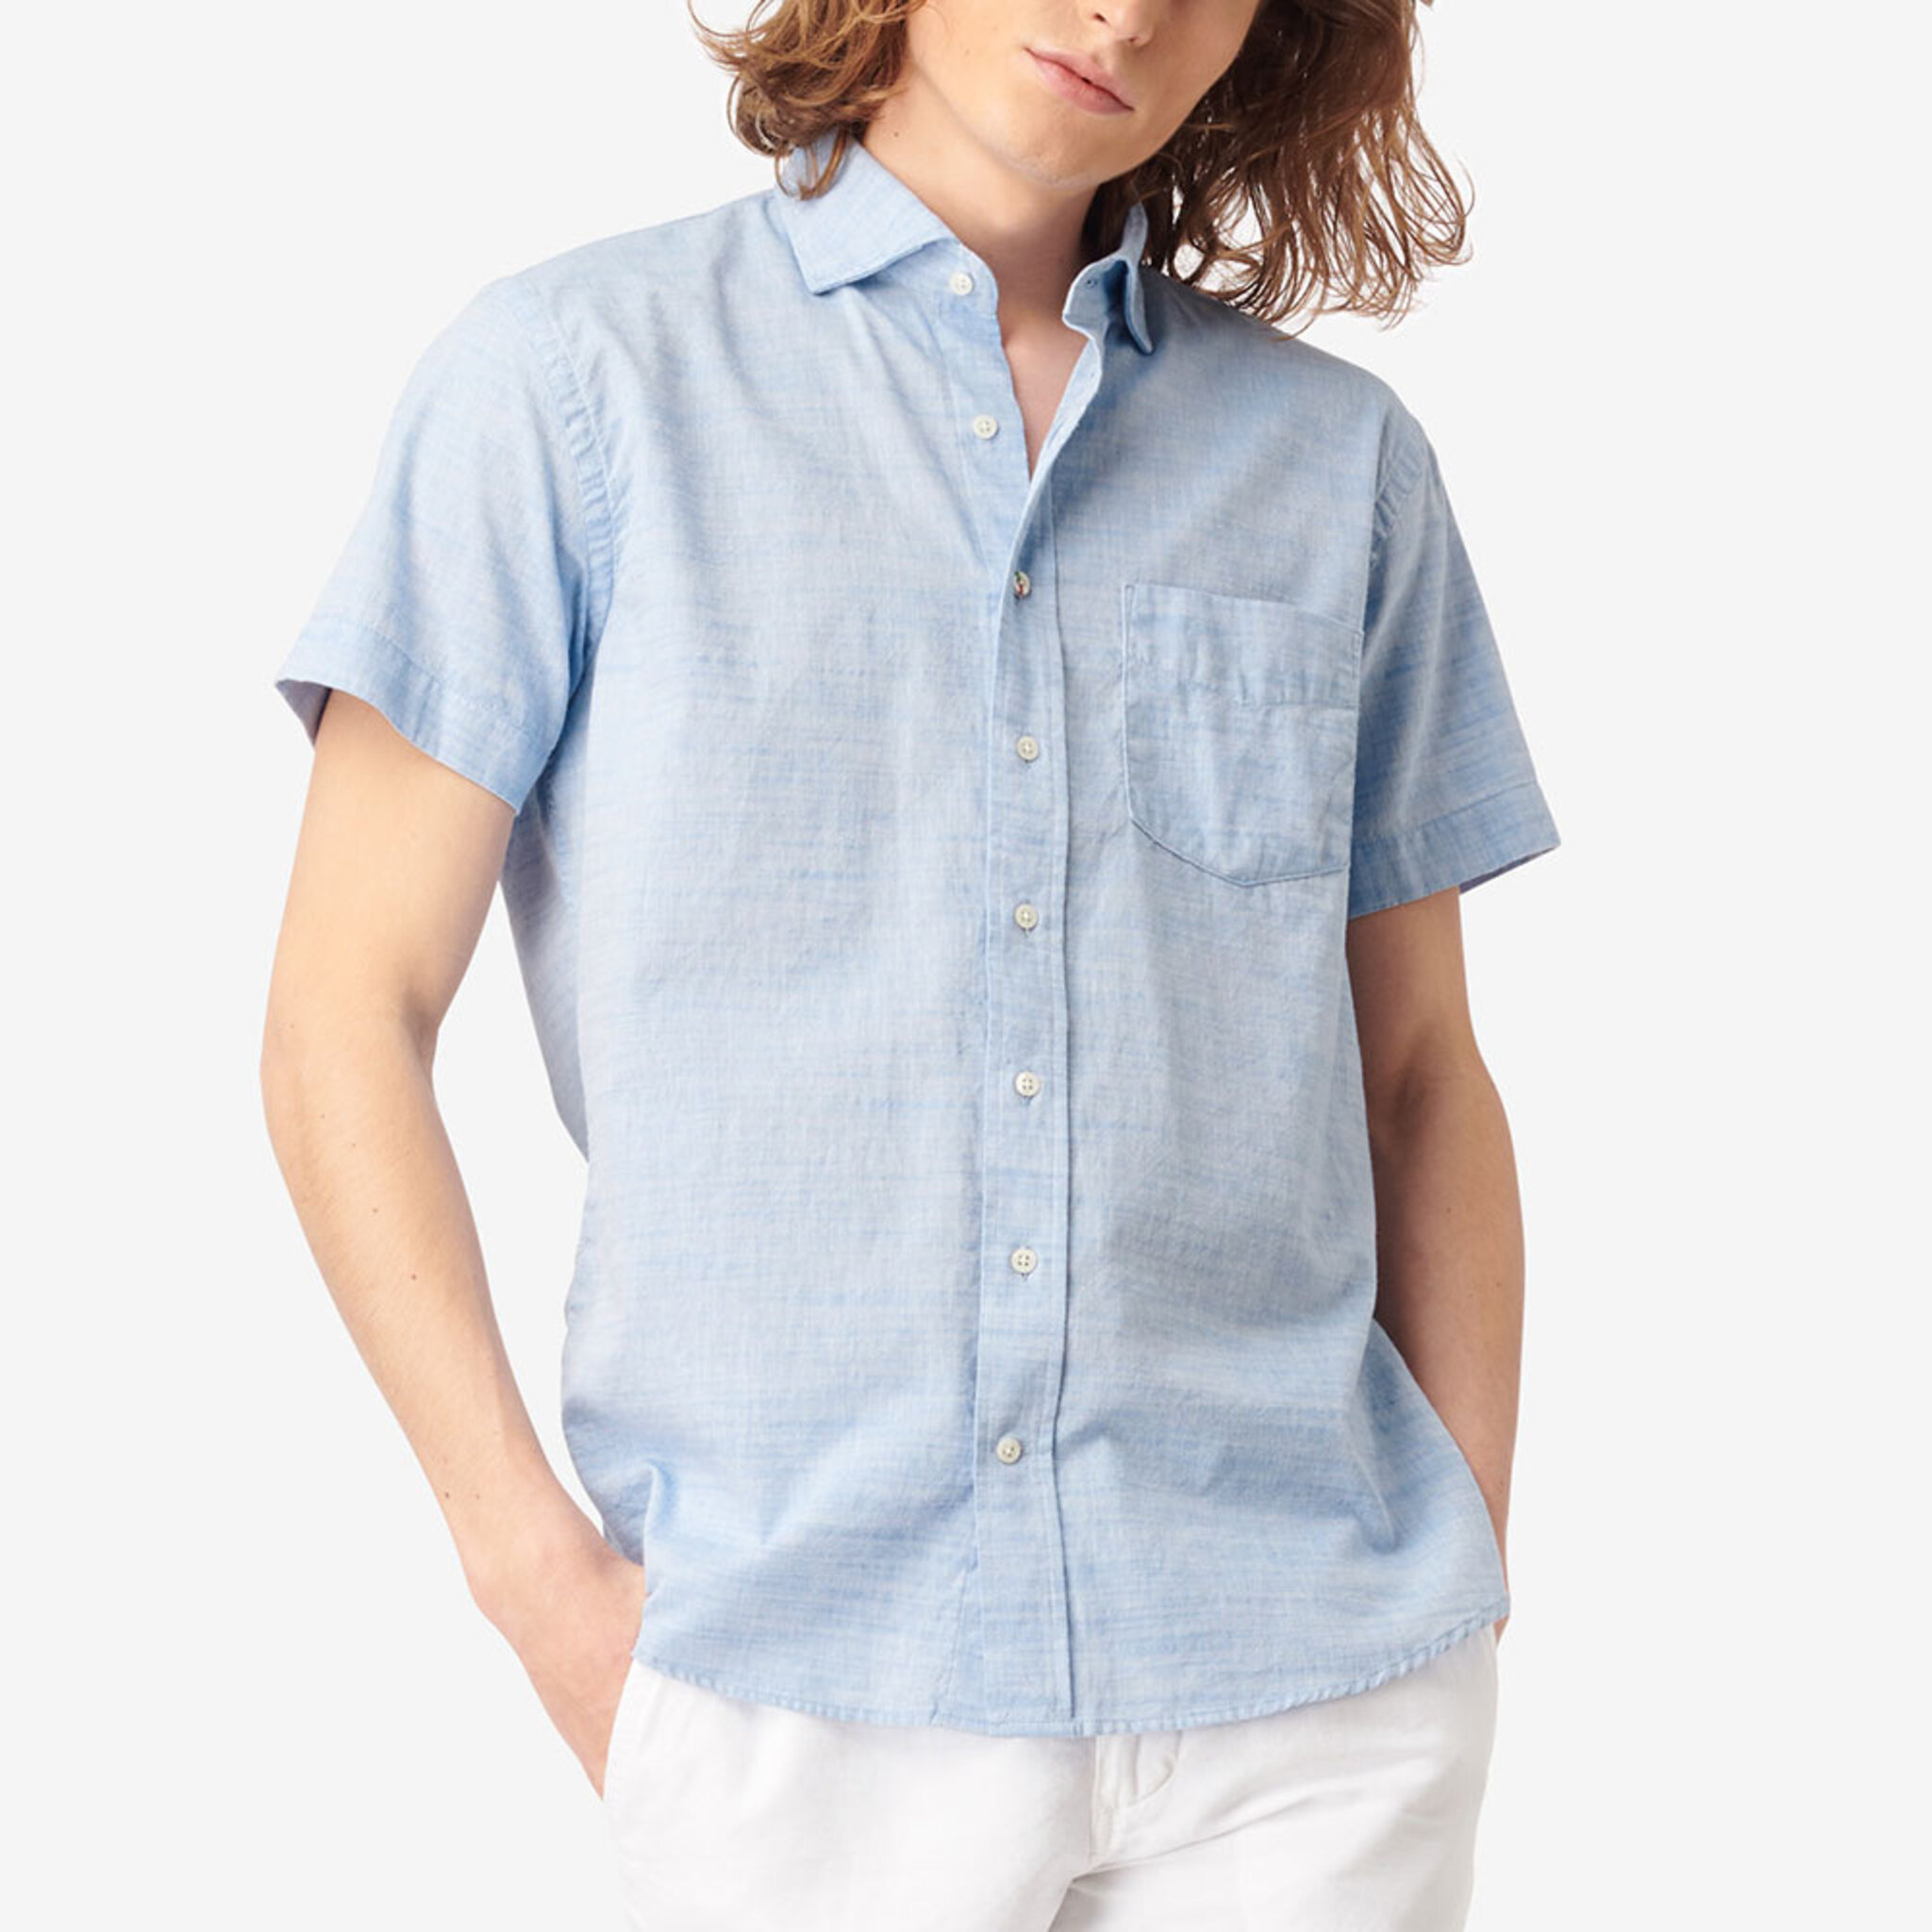 Leif S.S. Shirt